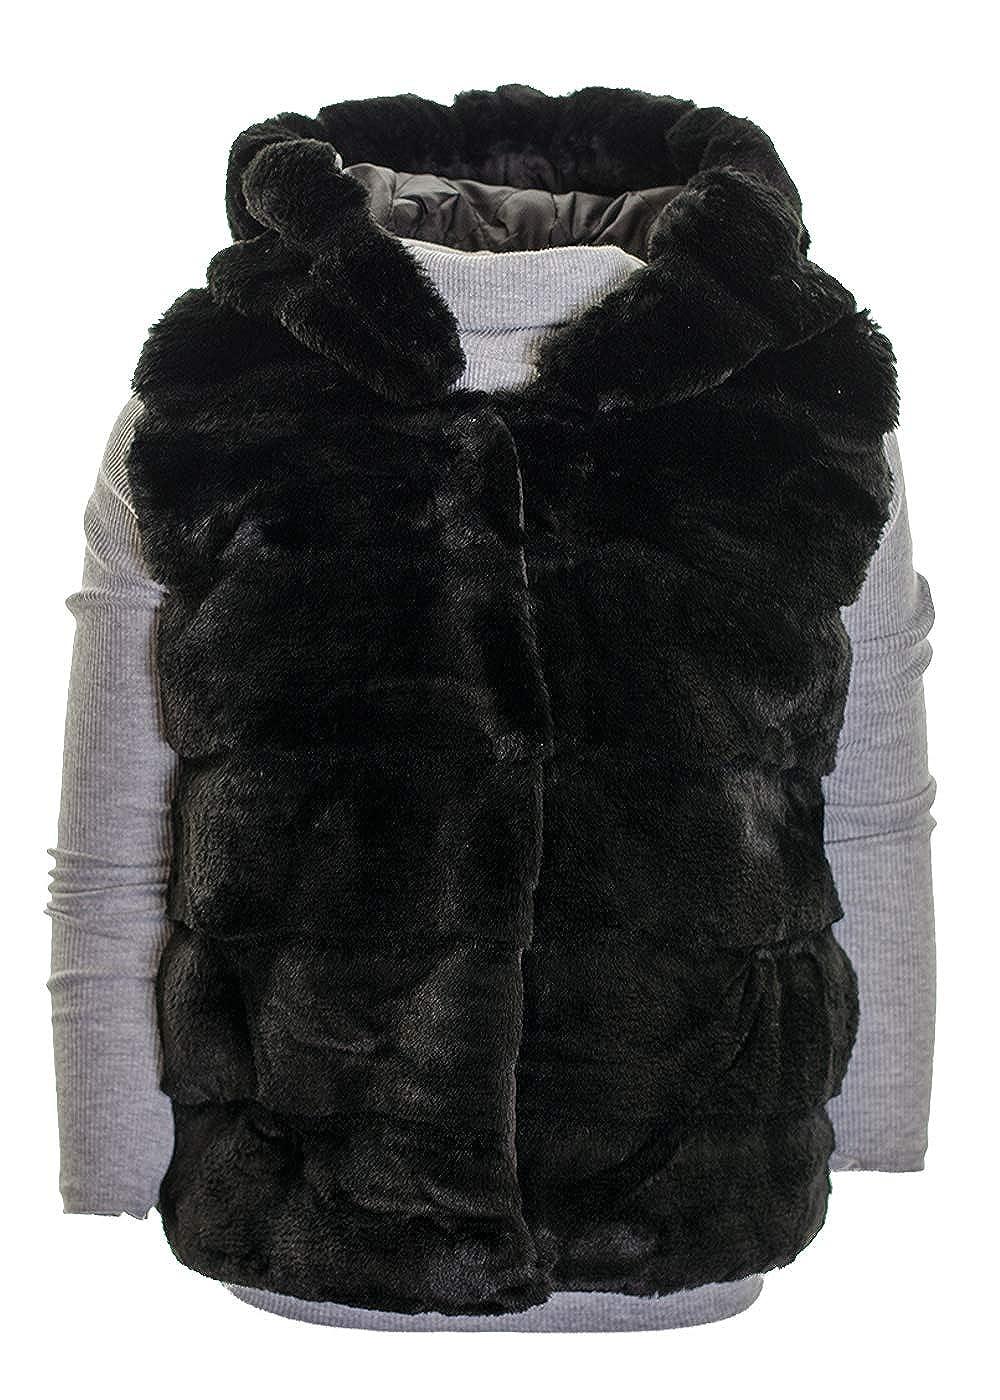 Girls's Faux Fur Hooded Gilet Mid Length Warm Winter Fashion Body Warmer Black